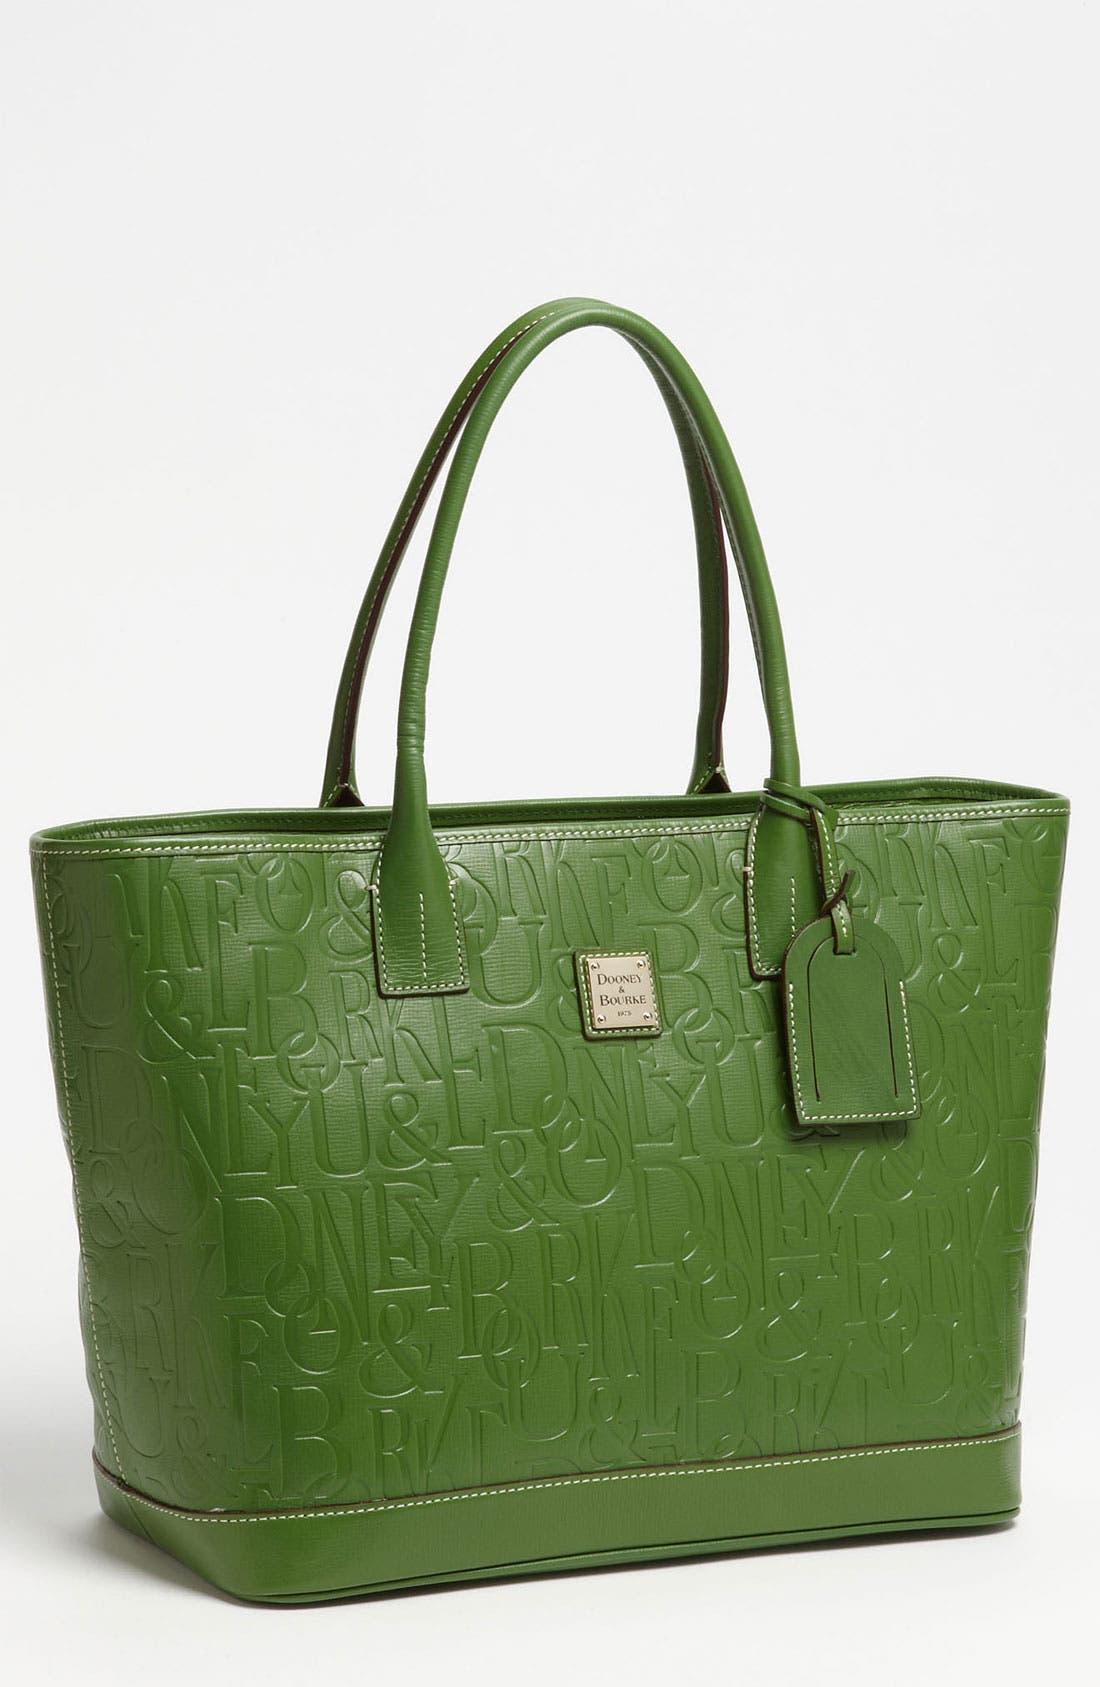 Main Image - Dooney & Bourke 'DB Retro - Medium Russel' Embossed Leather Tote